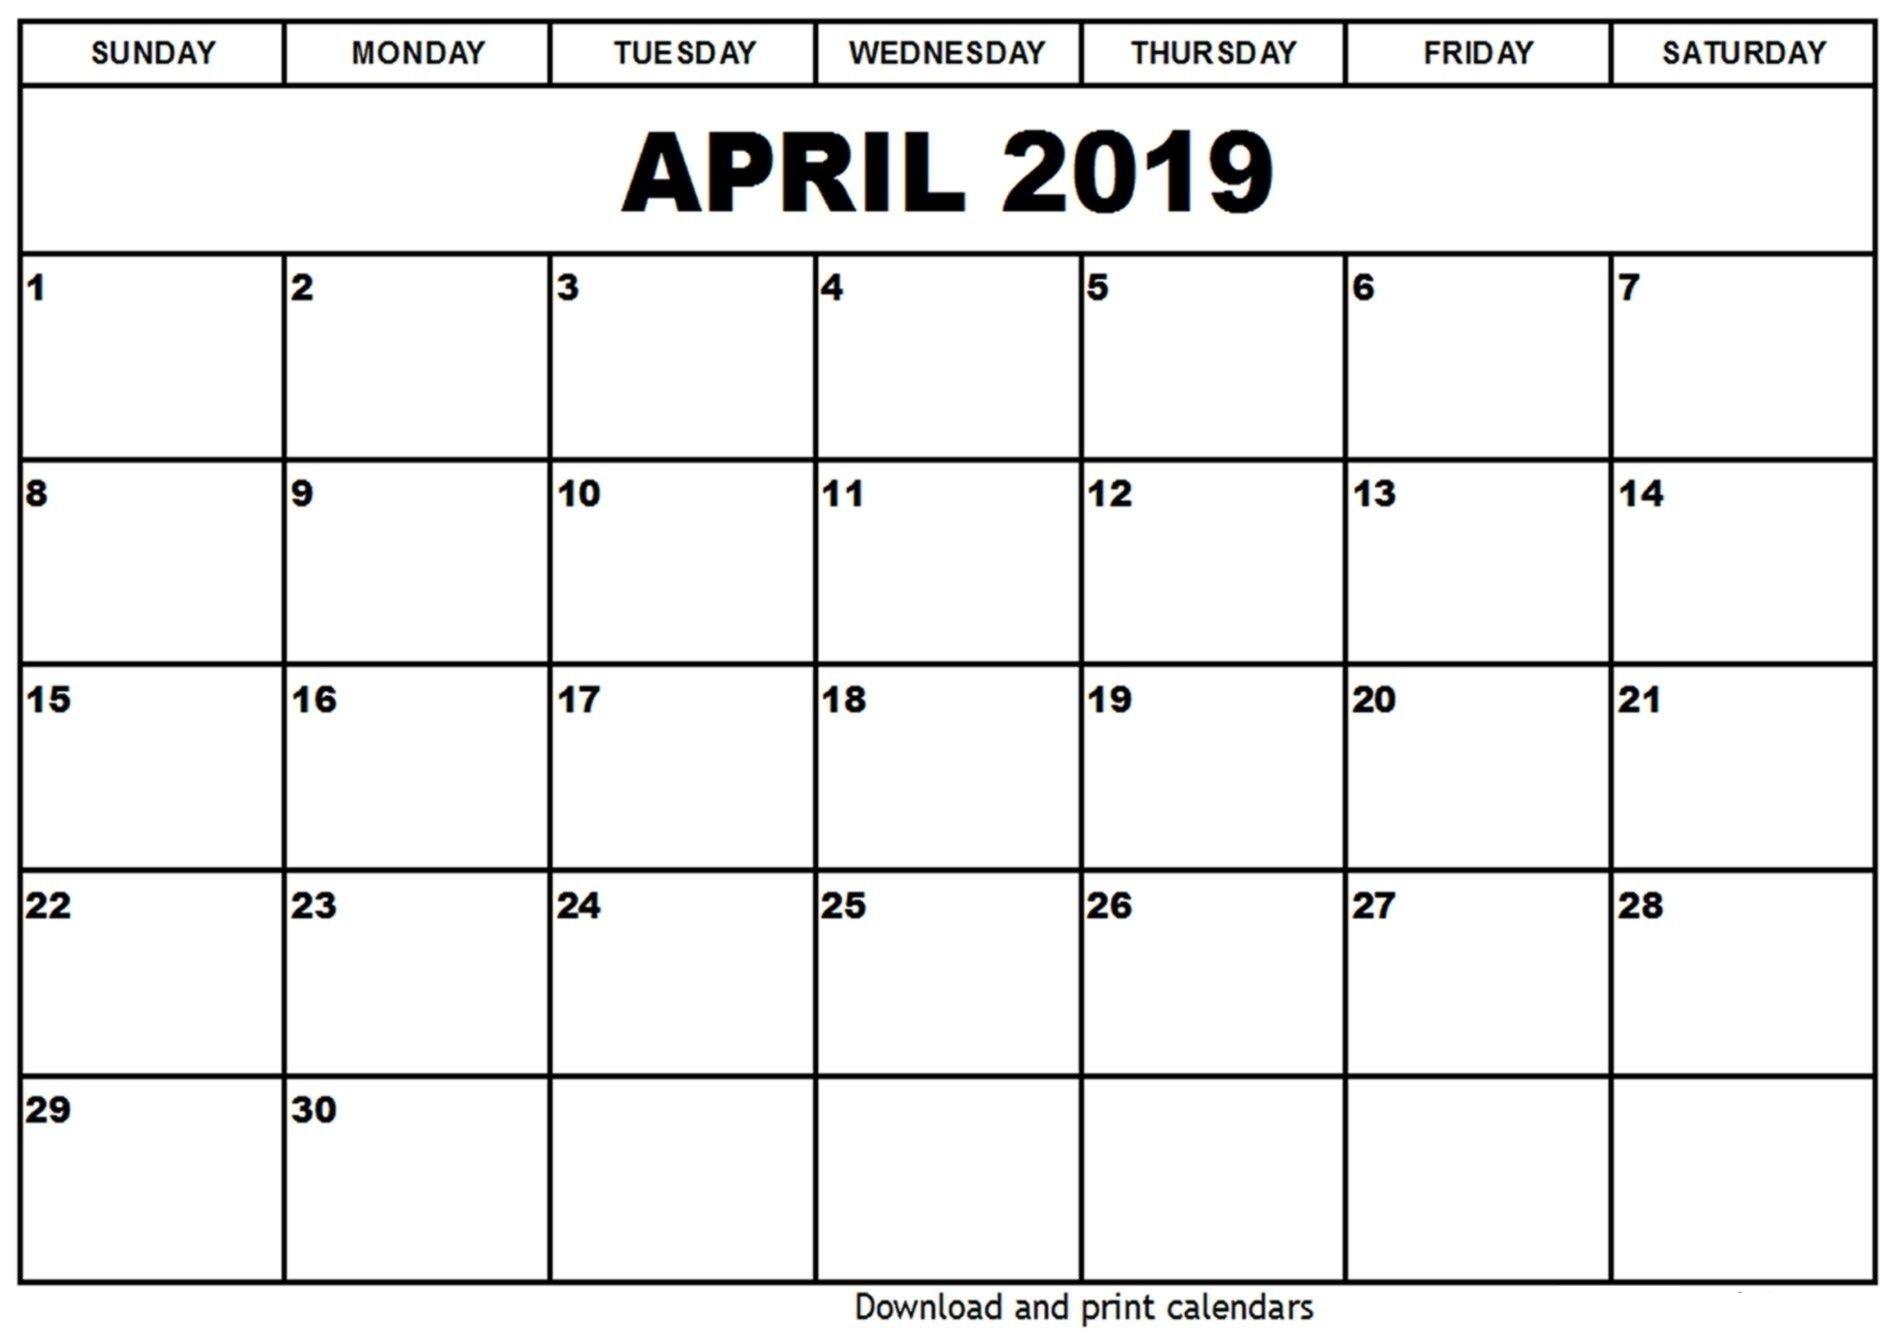 April 5 2019 Calendar   Calendar Format Example April 5 2019 Calendar